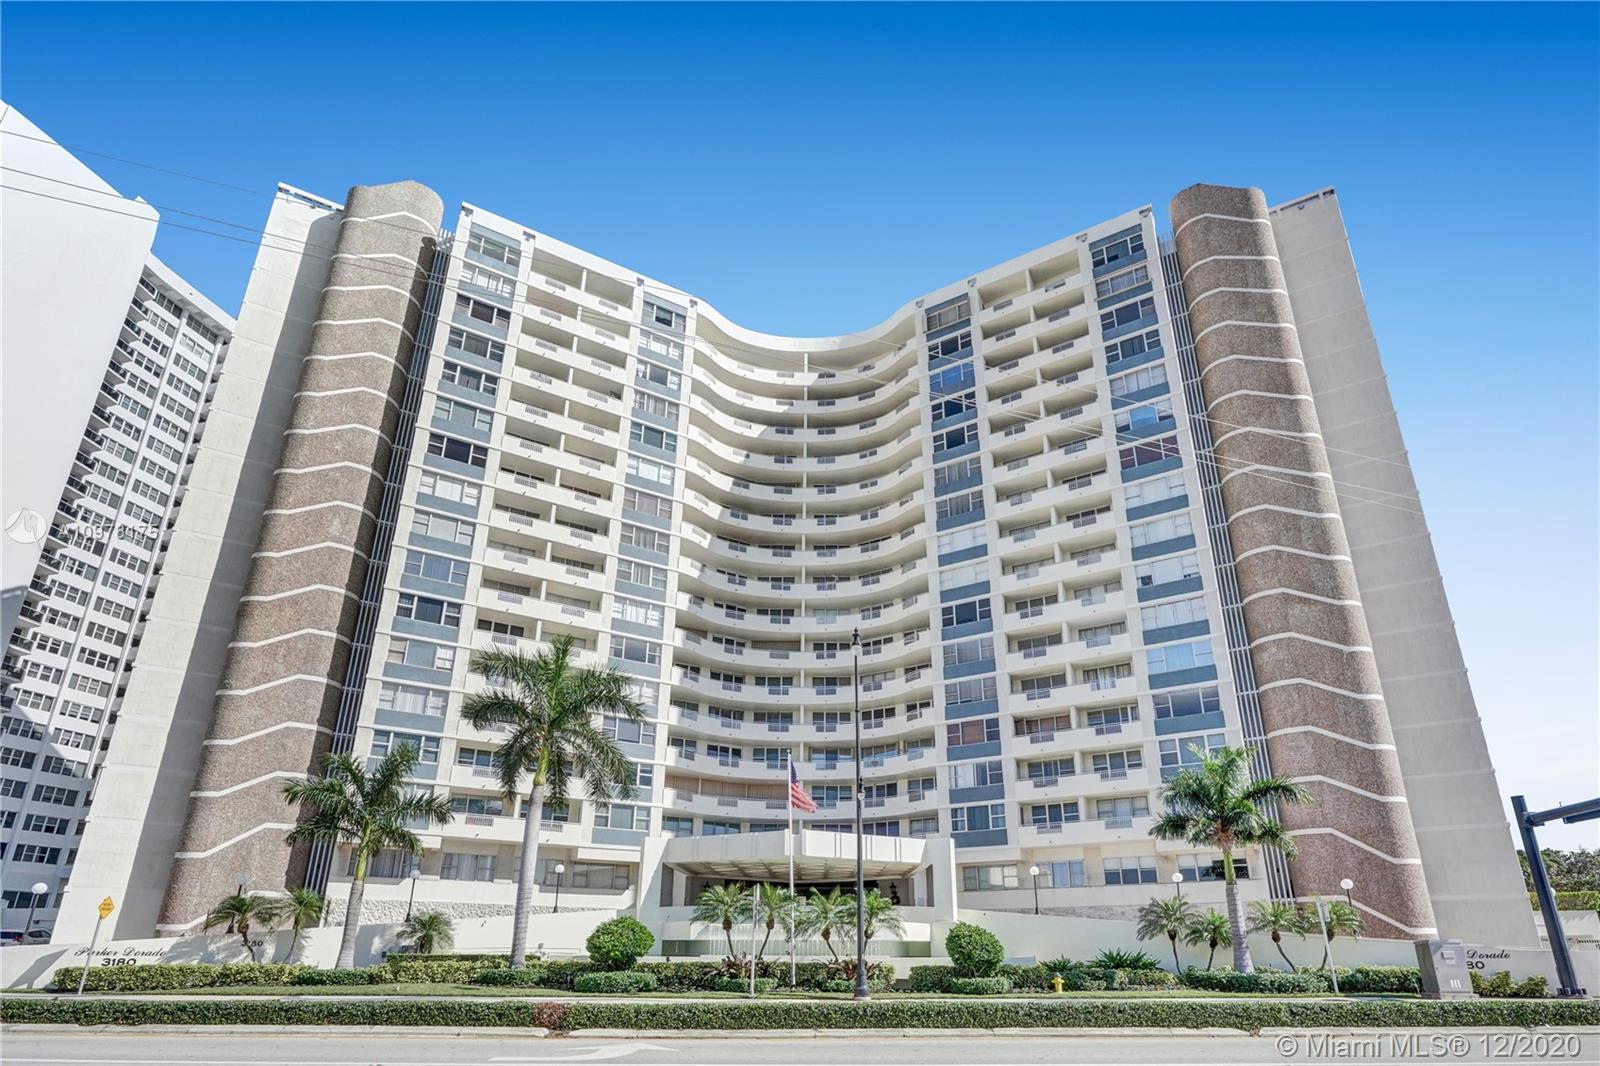 Parker Dorado #709 - 3180 S Ocean Dr #709, Hallandale Beach, FL 33009